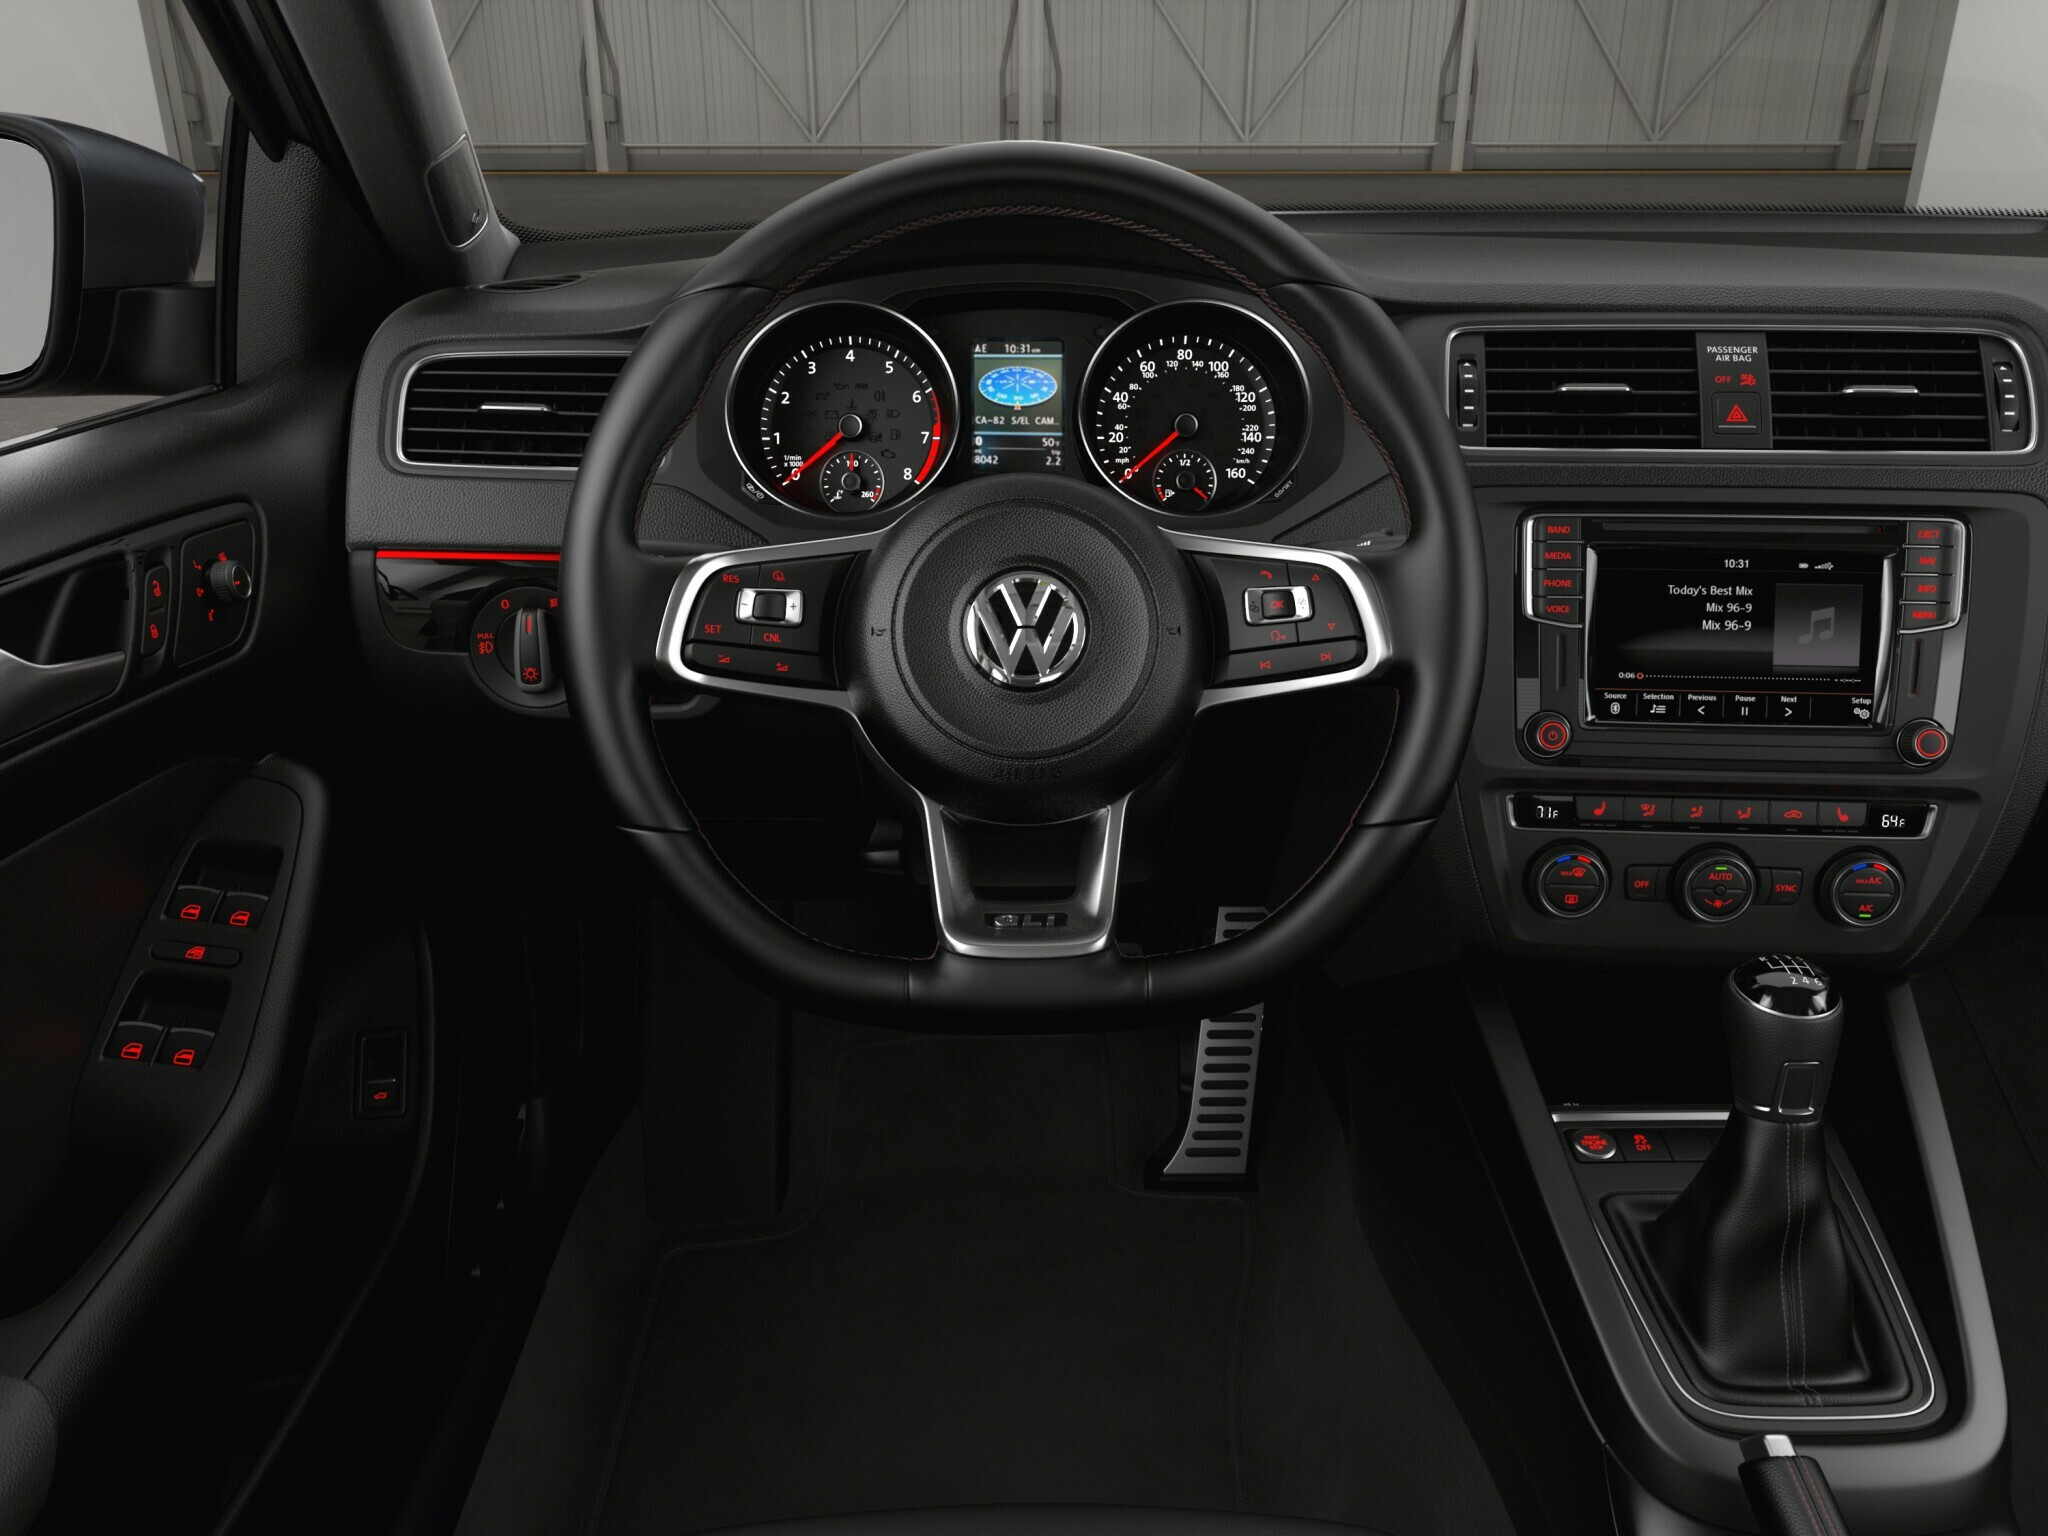 2017 Volkswagen Jetta Interior | www.indiepedia.org